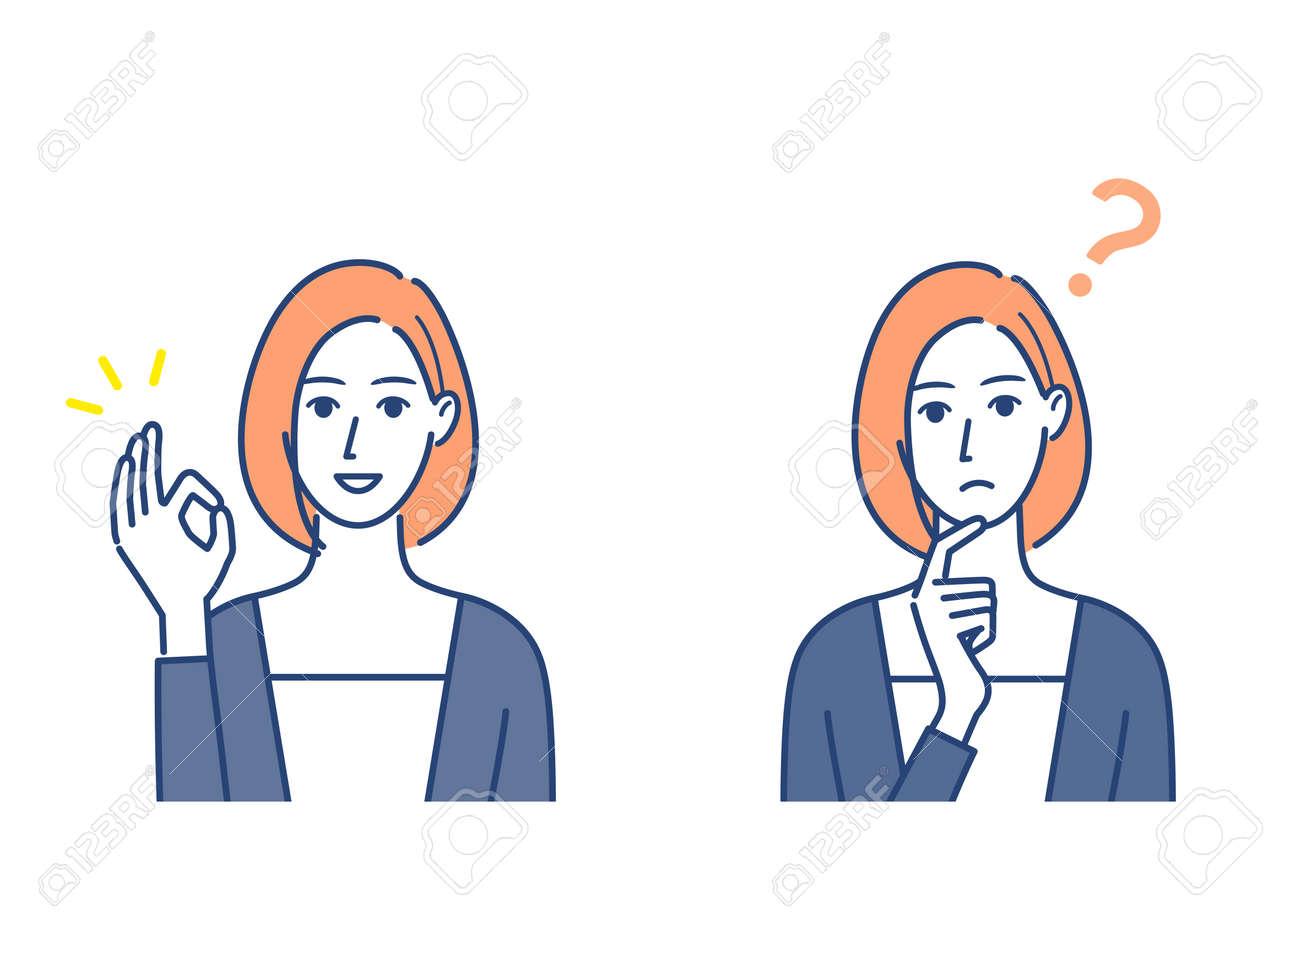 OK and question mark signature female illustration set - 167776468